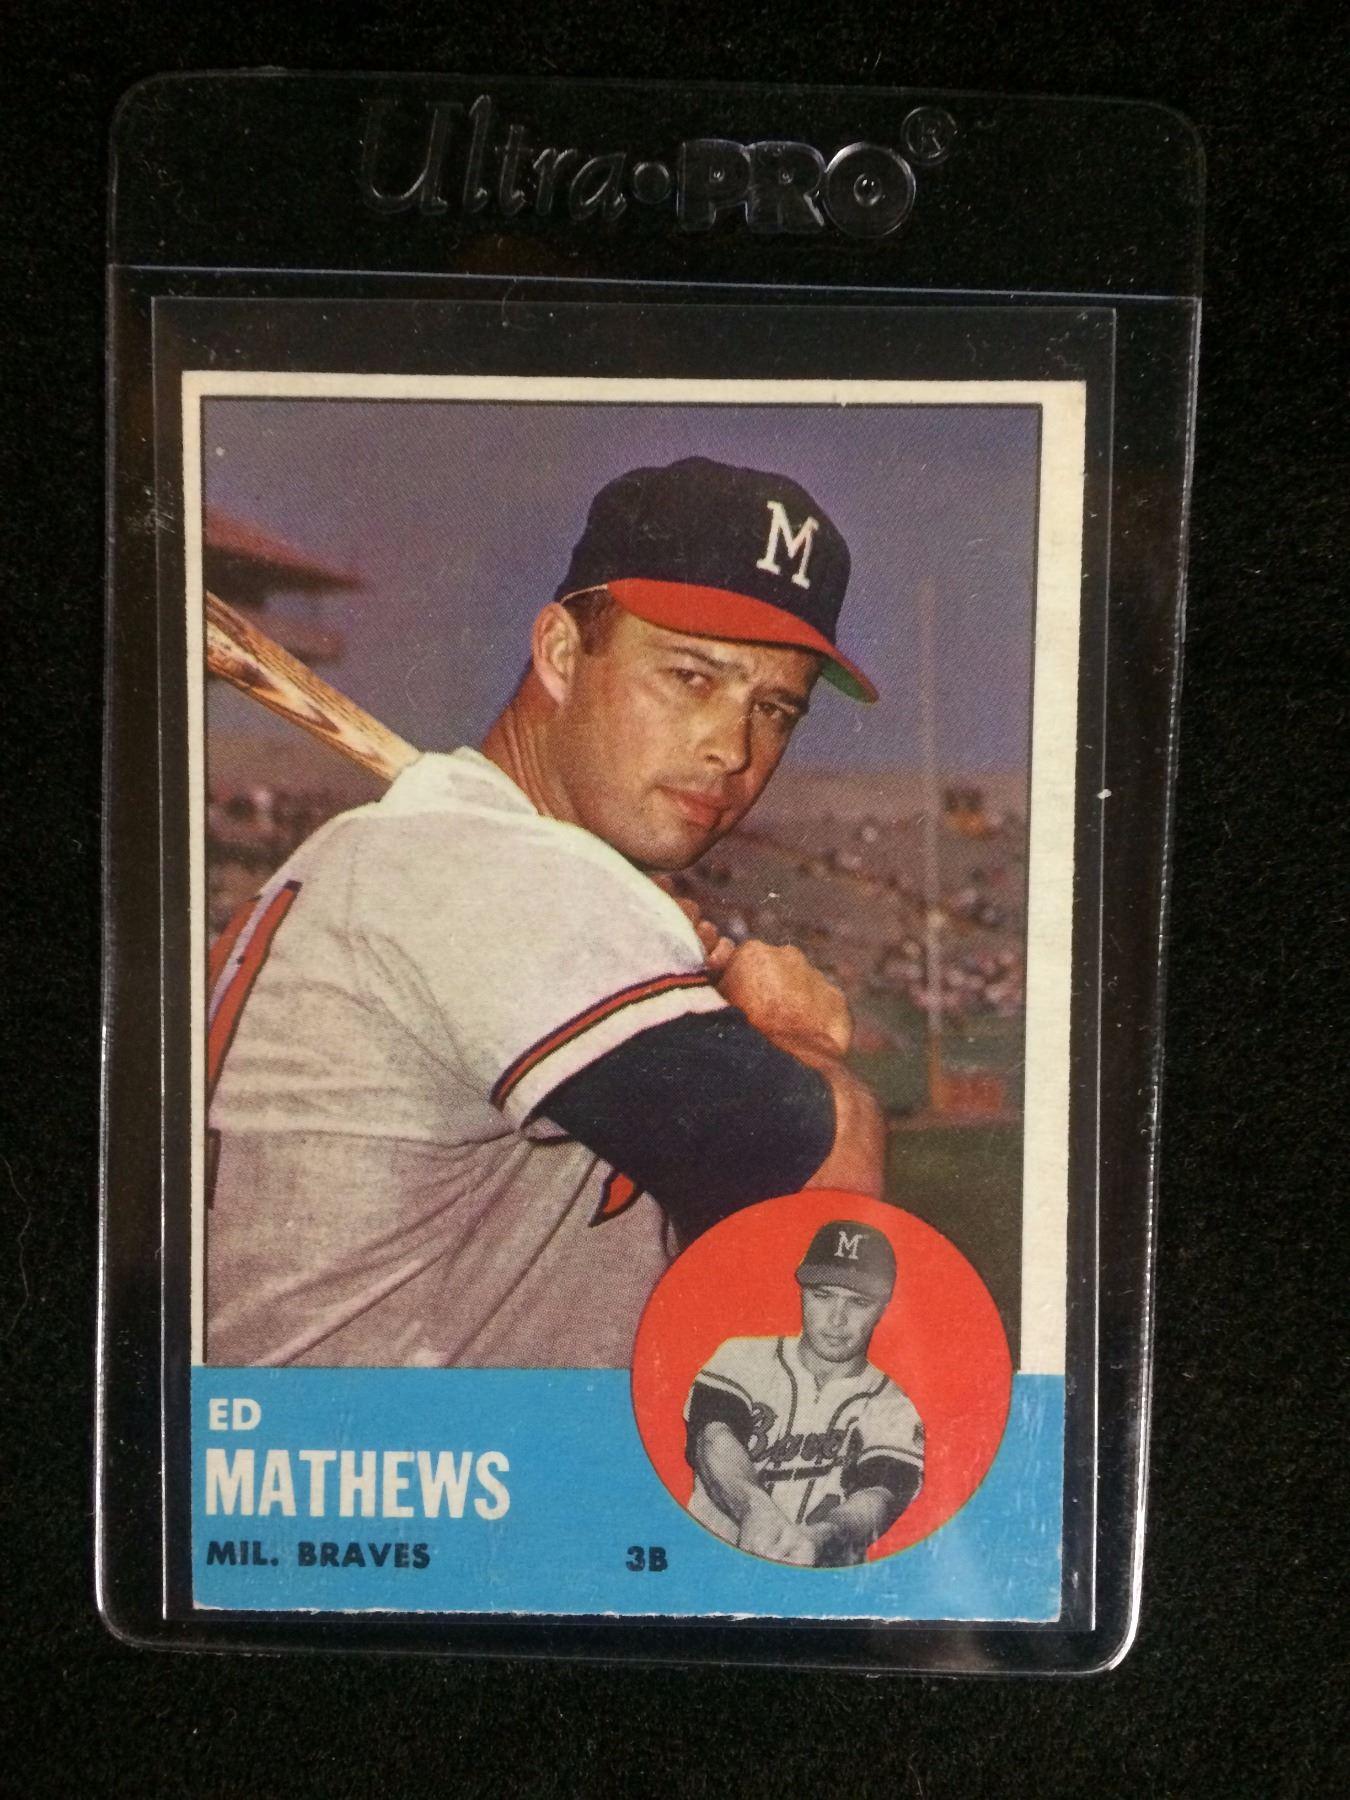 1963 Topps Baseball Card 275 Ed Mathews Milwaukee Braves